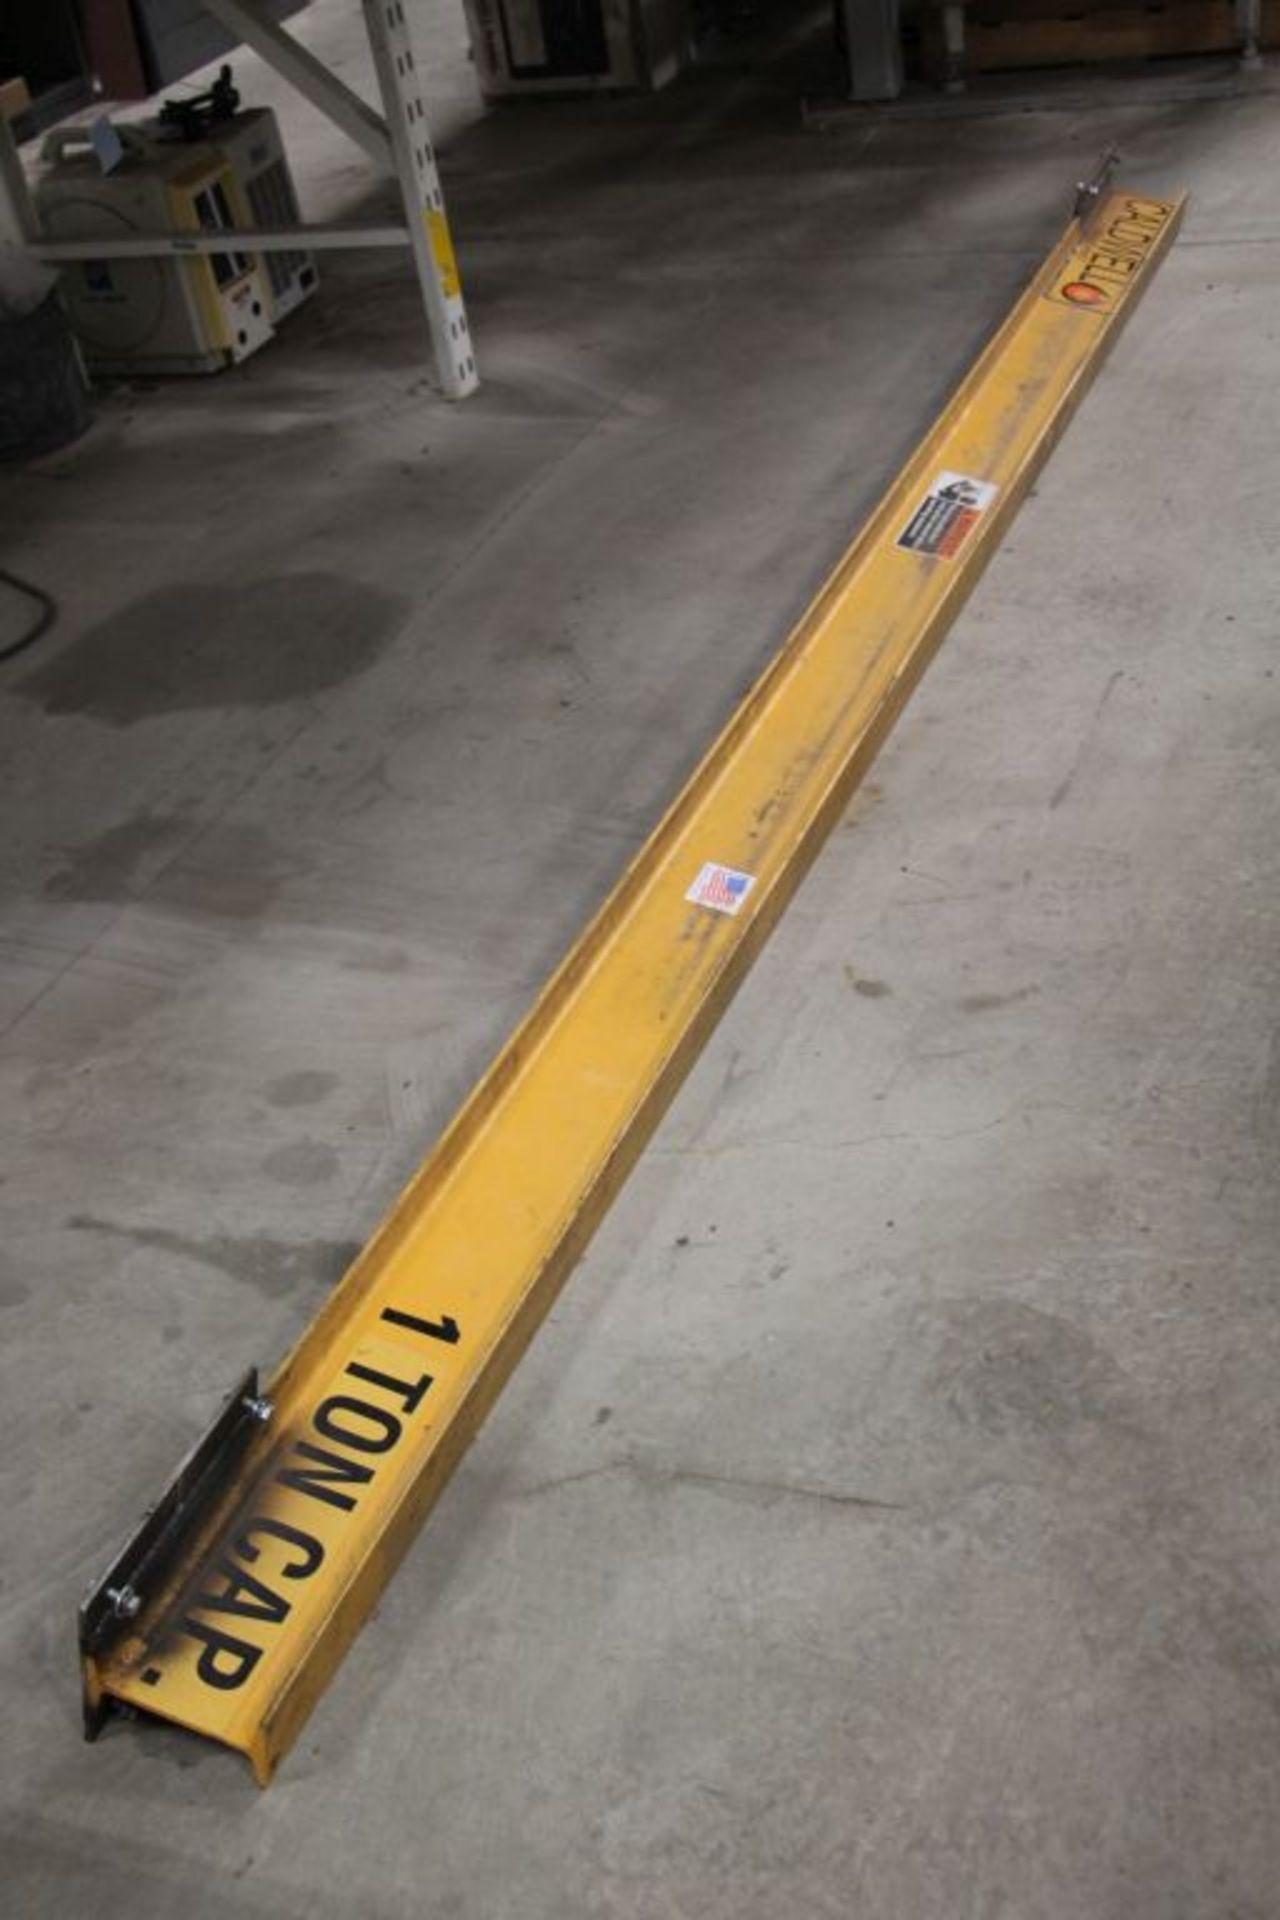 Lot 16 - CM Valuster 1 Ton Overhead Hoist with 12' beam, series 635